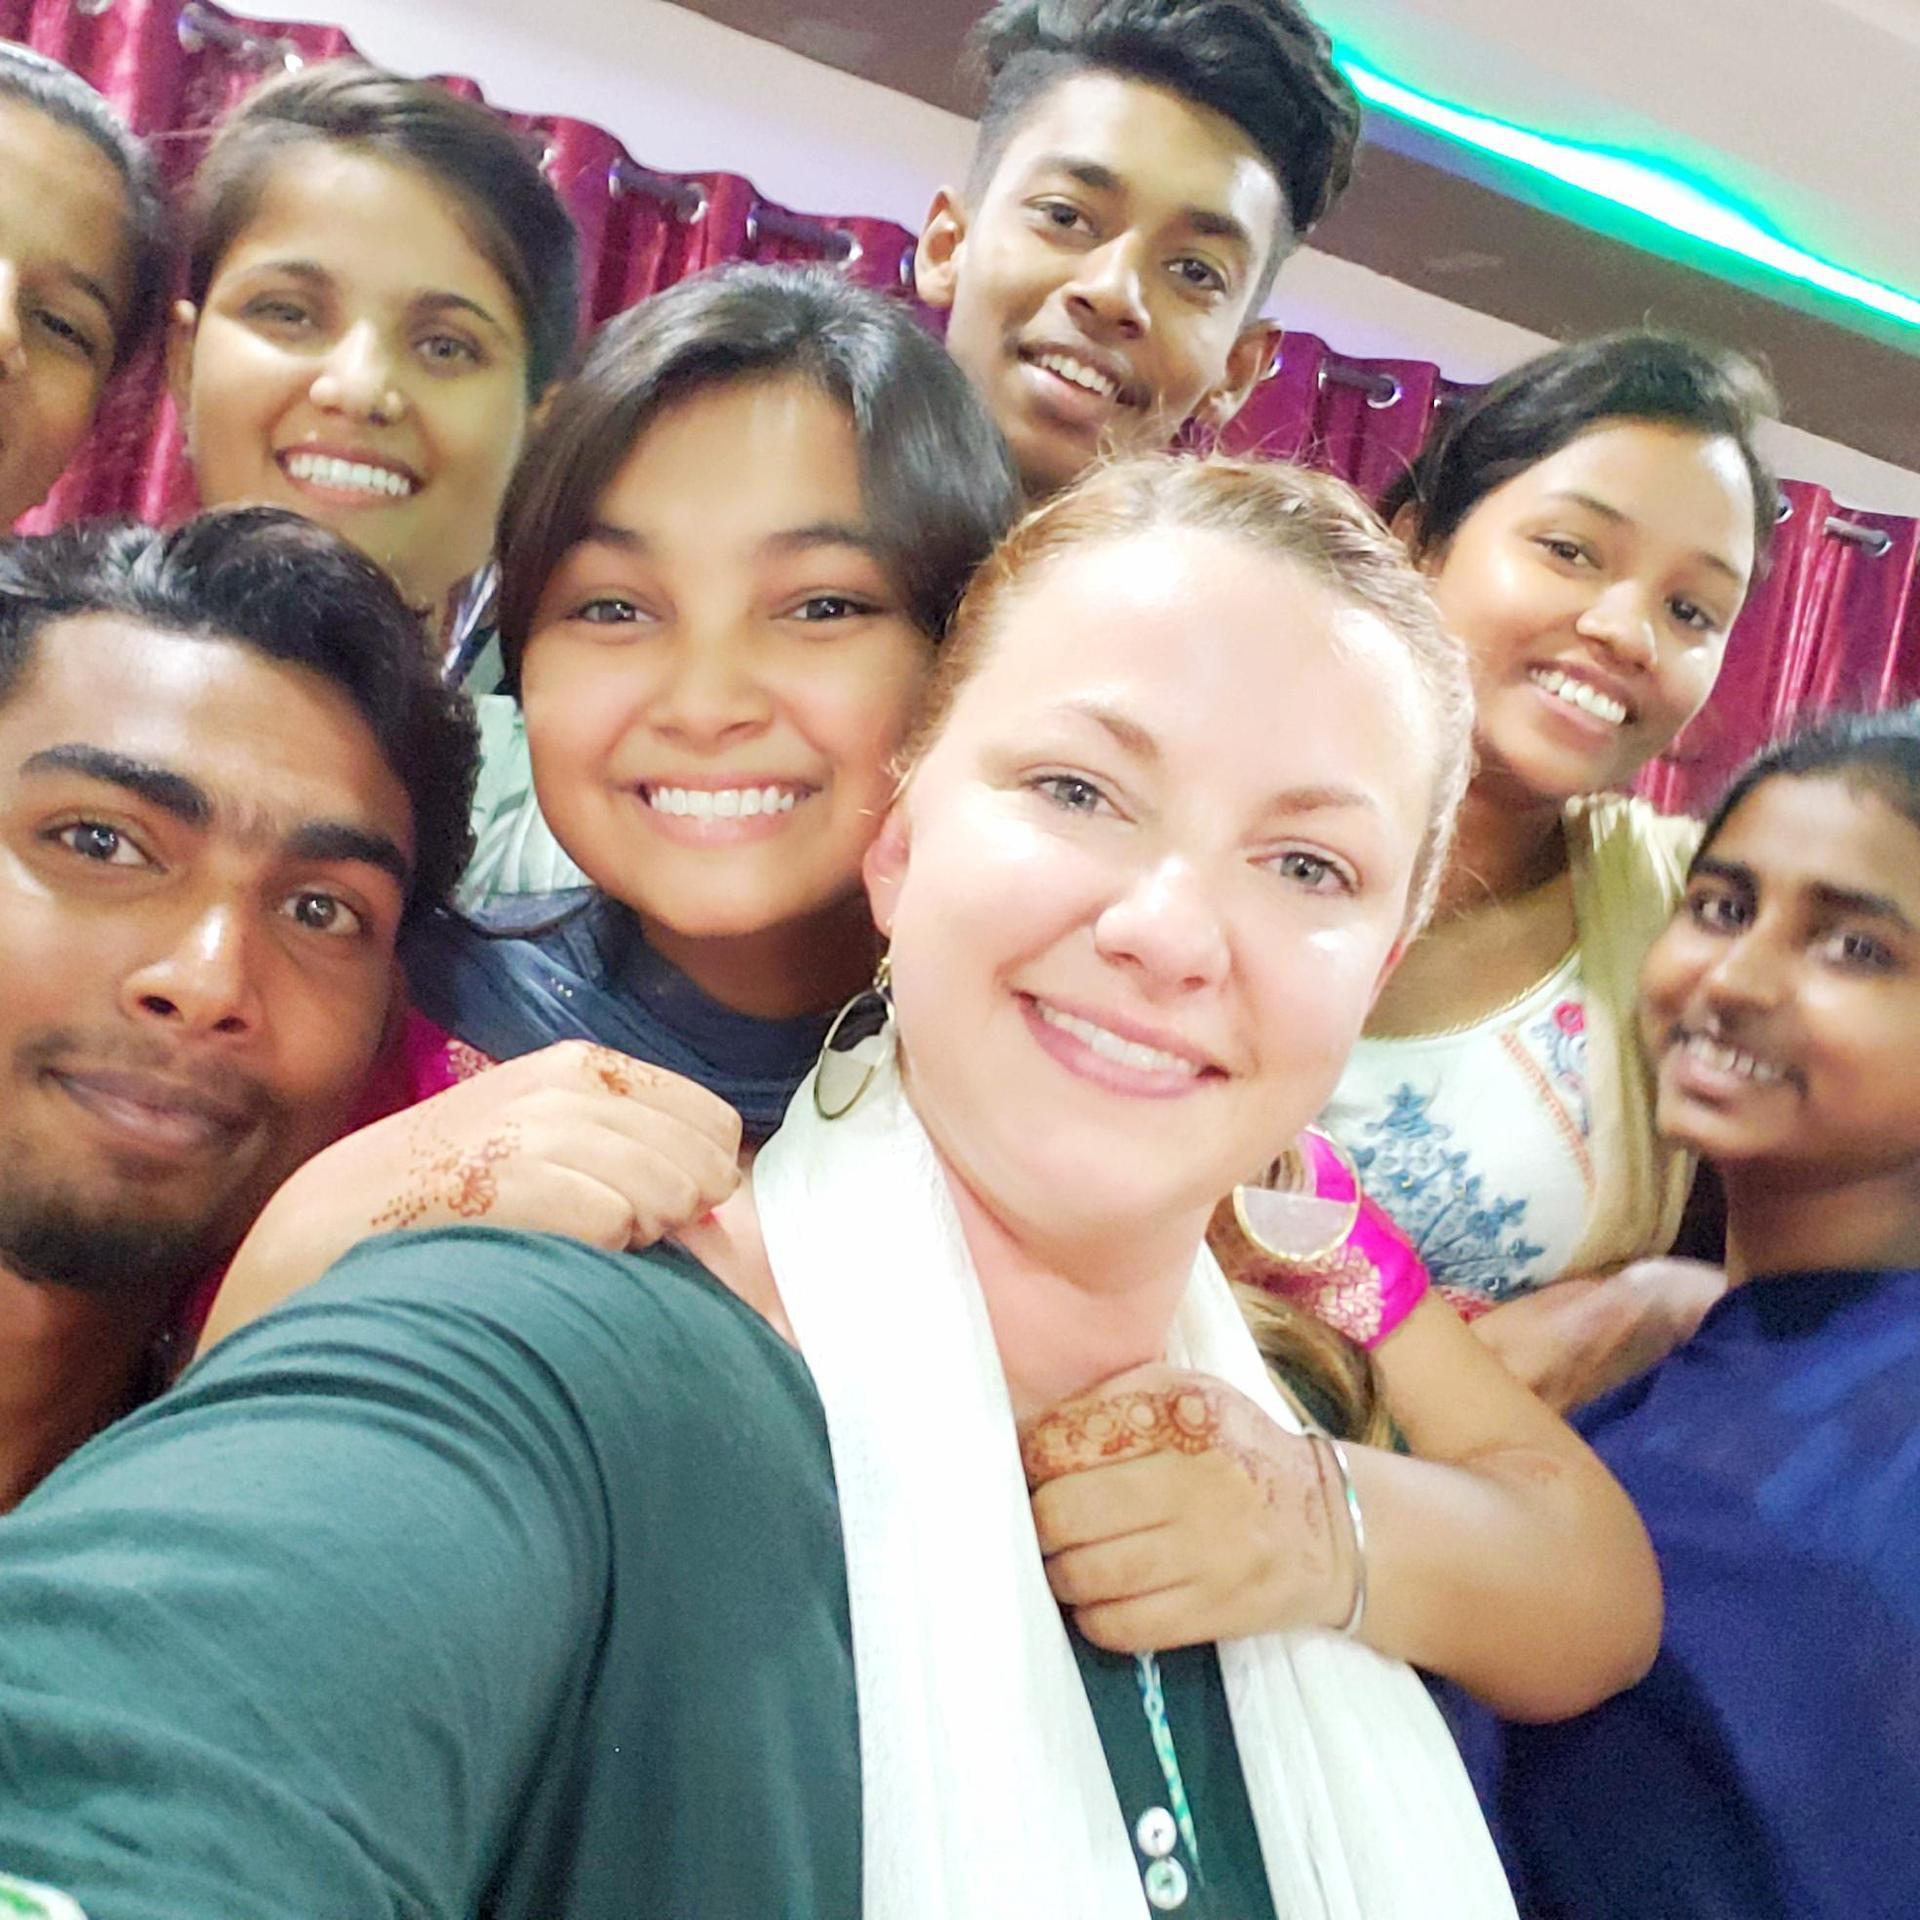 India Friends